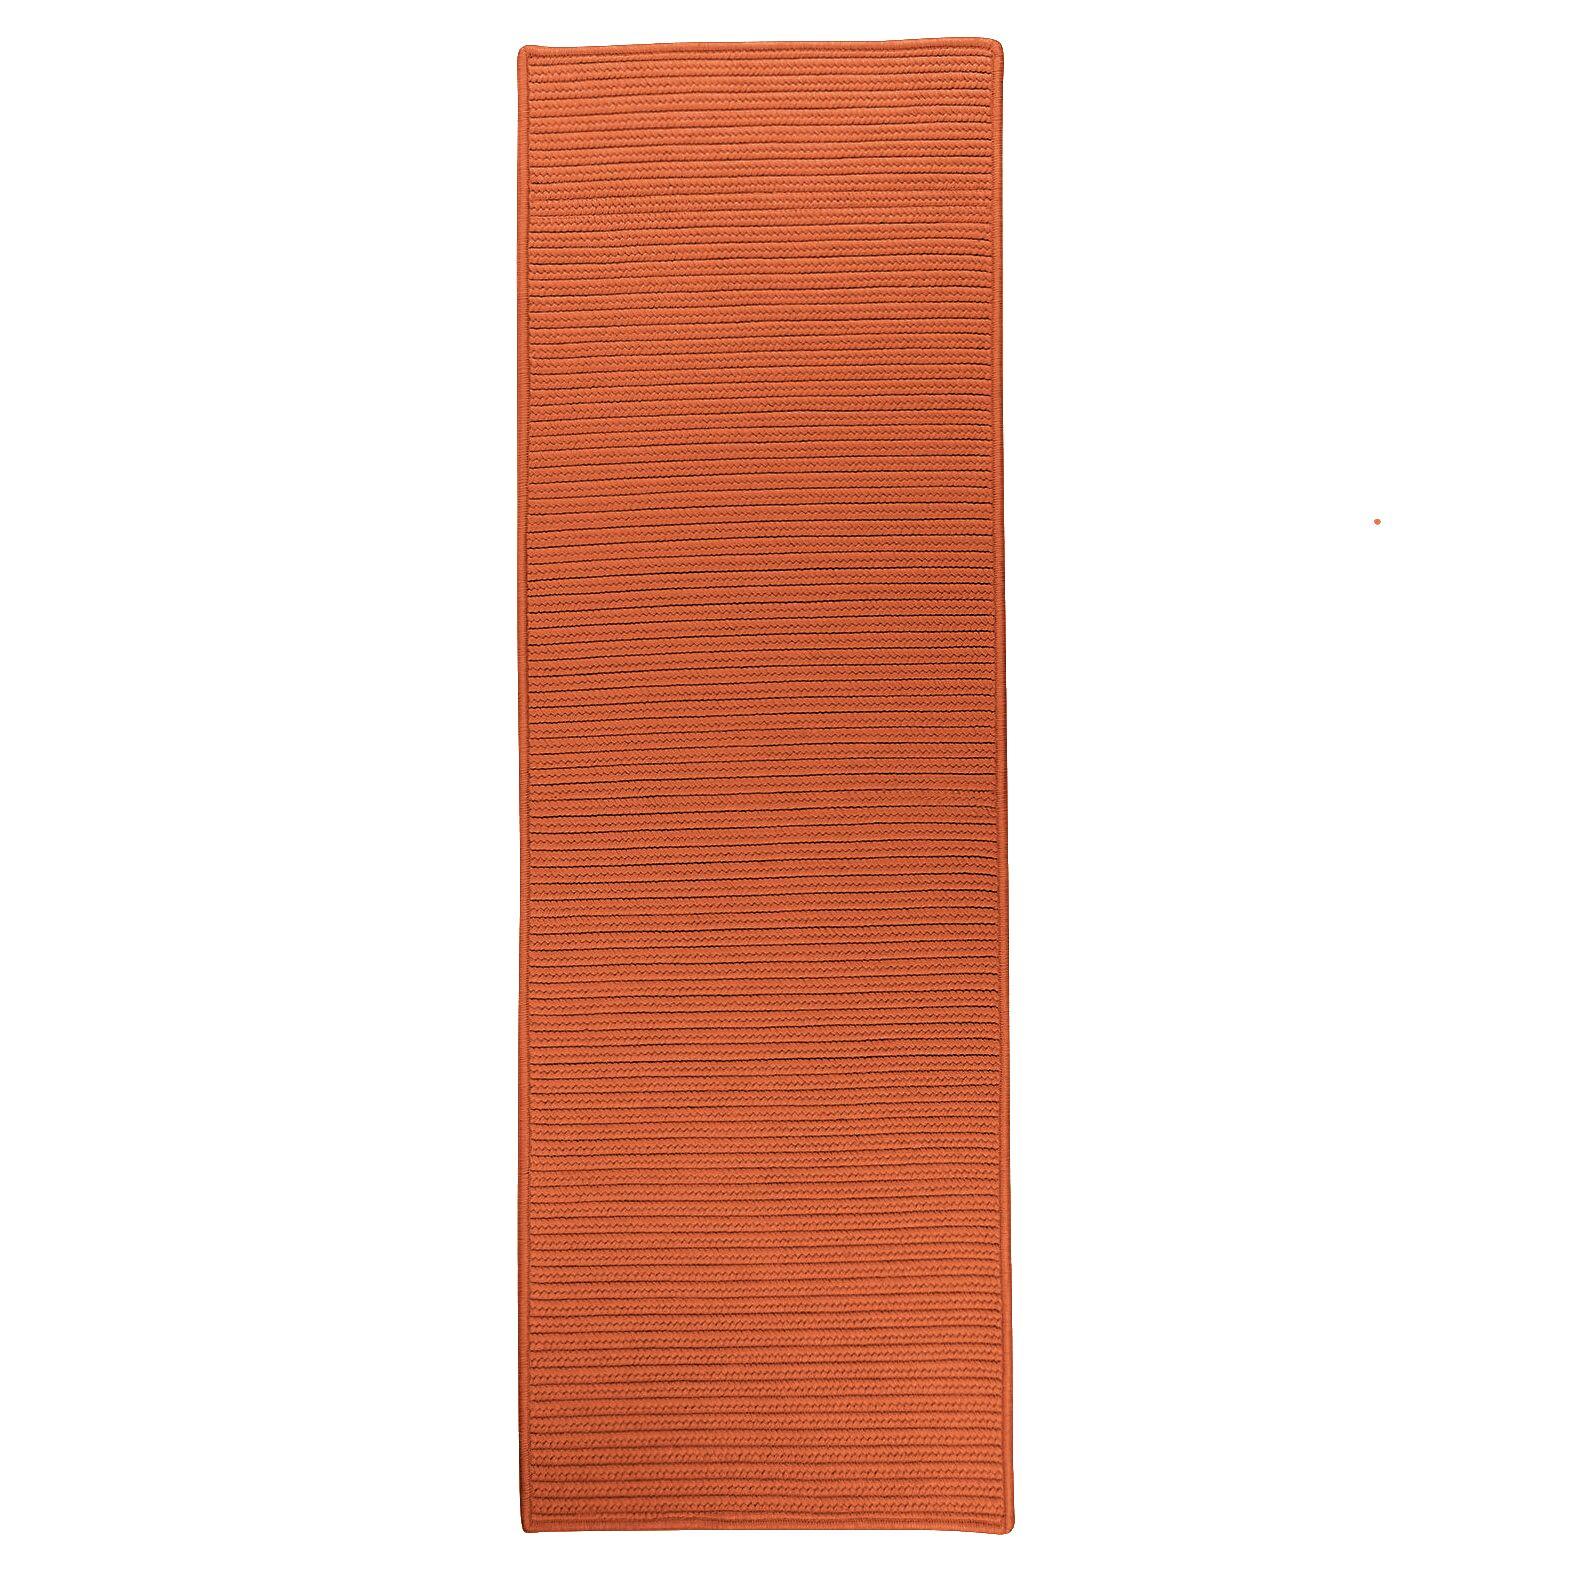 Bryanna Reversible Hand-Braided Orange Indoor/Outdoor Area Rug Rug Size: Runner 2'4